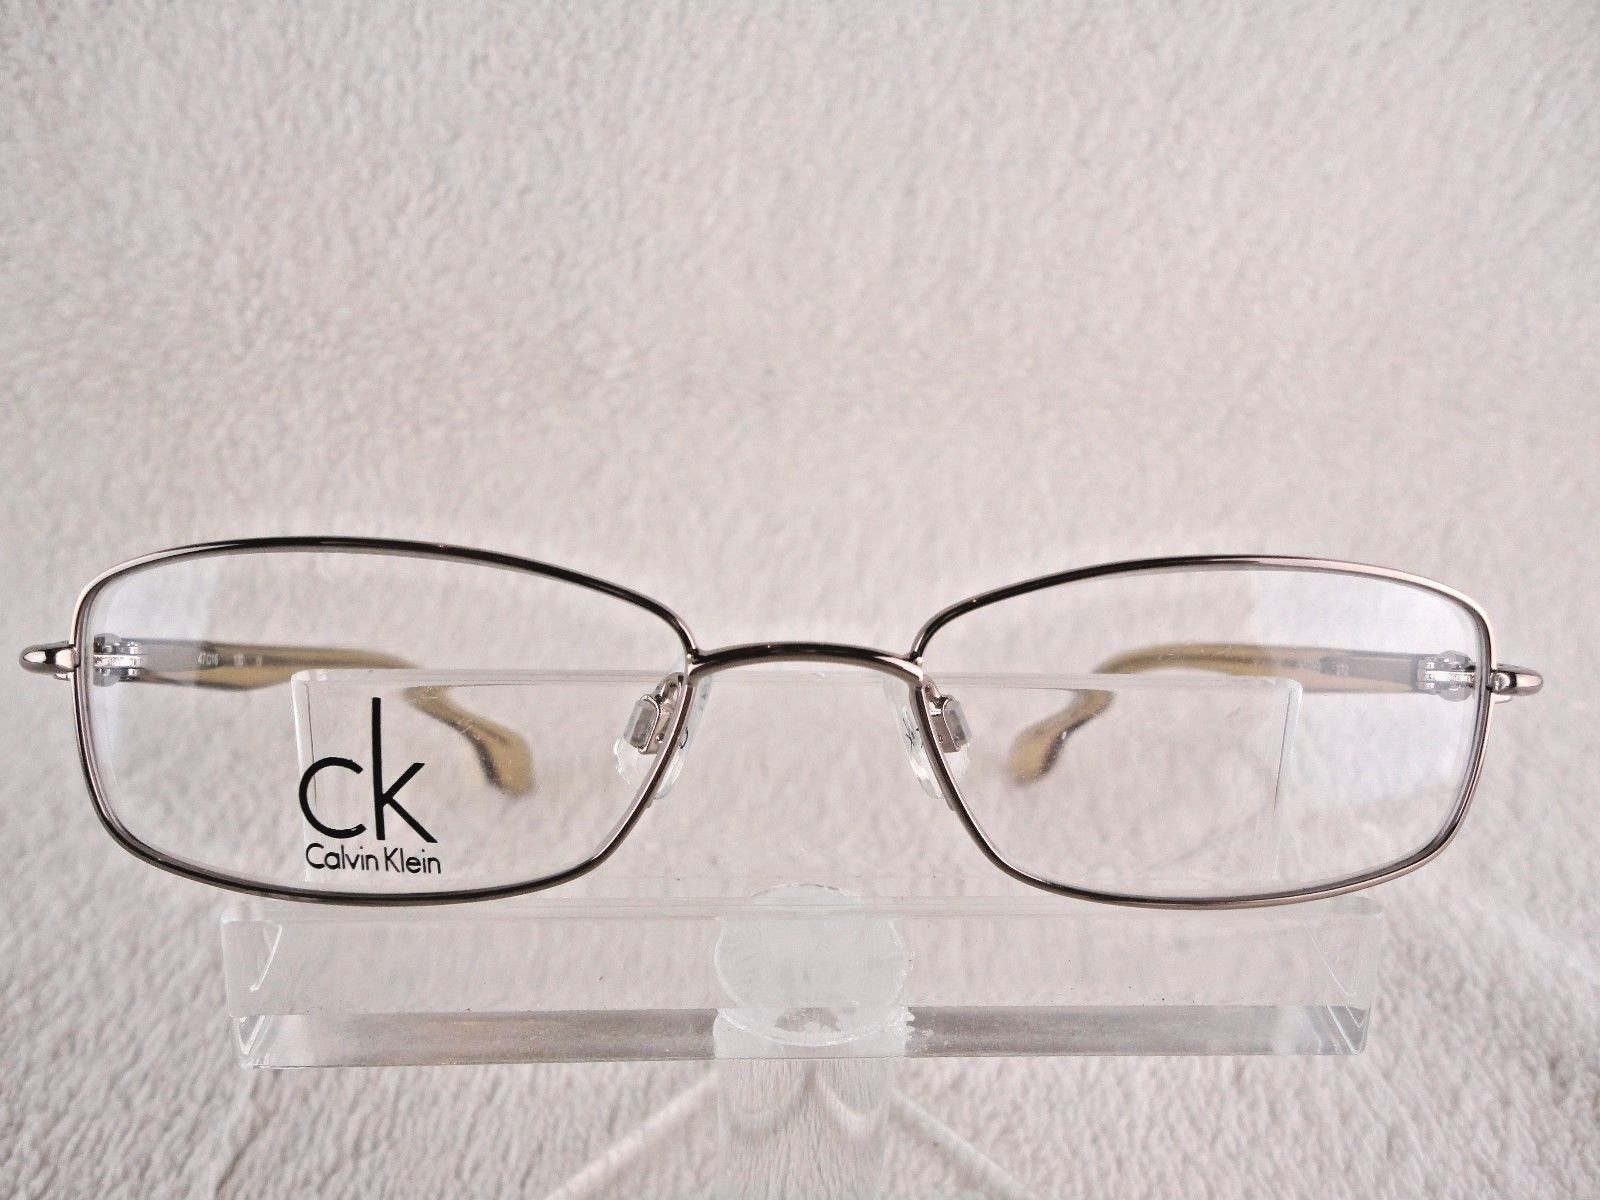 Calvin Klein CK 5299 (272) Taupe 47 x 16 130 mm PETITE Eyeglass Frames